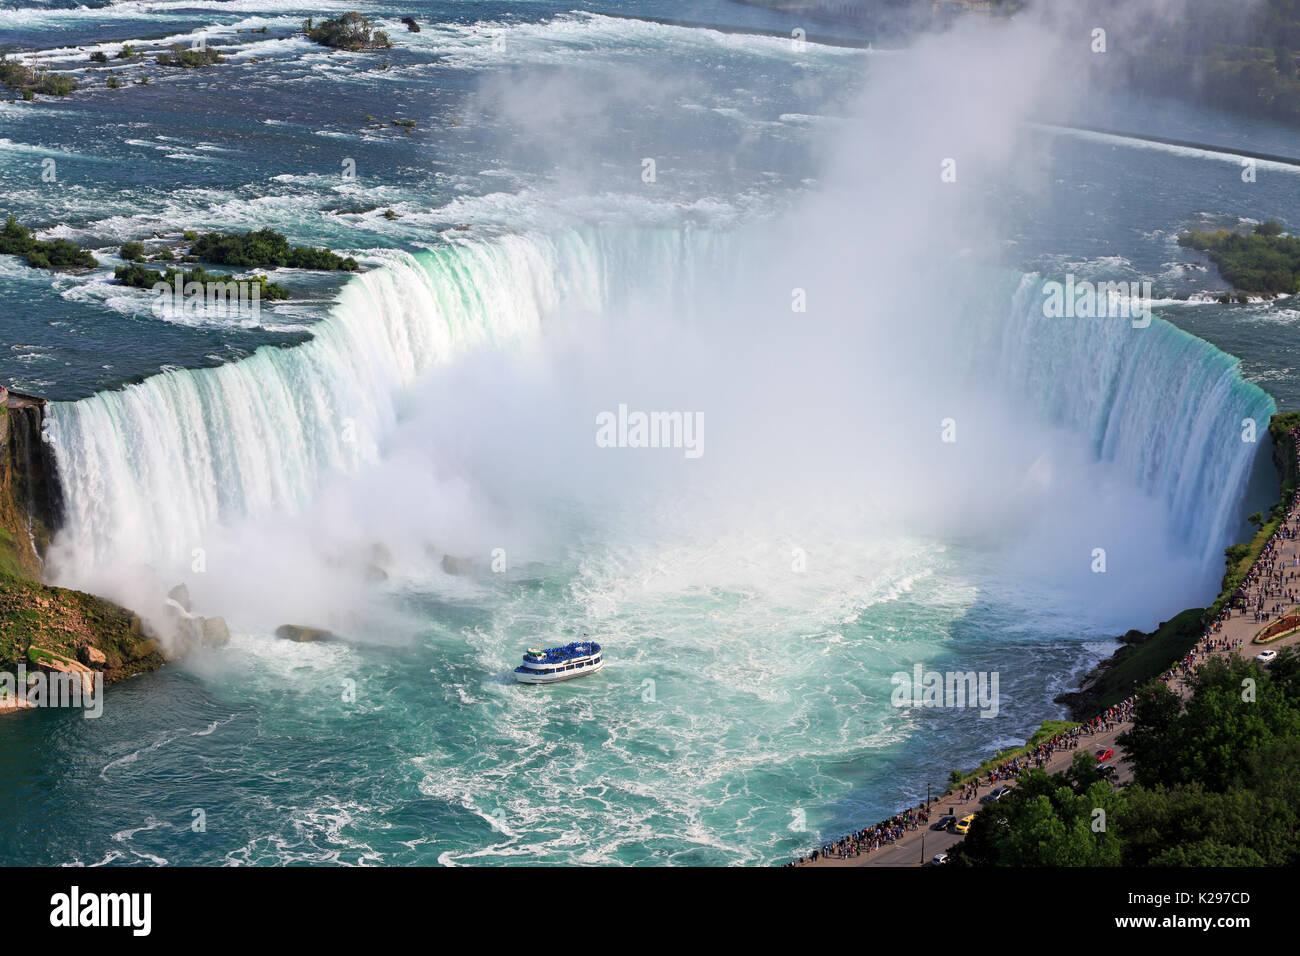 Niagara Falls, aerial view, Canada - Stock Image